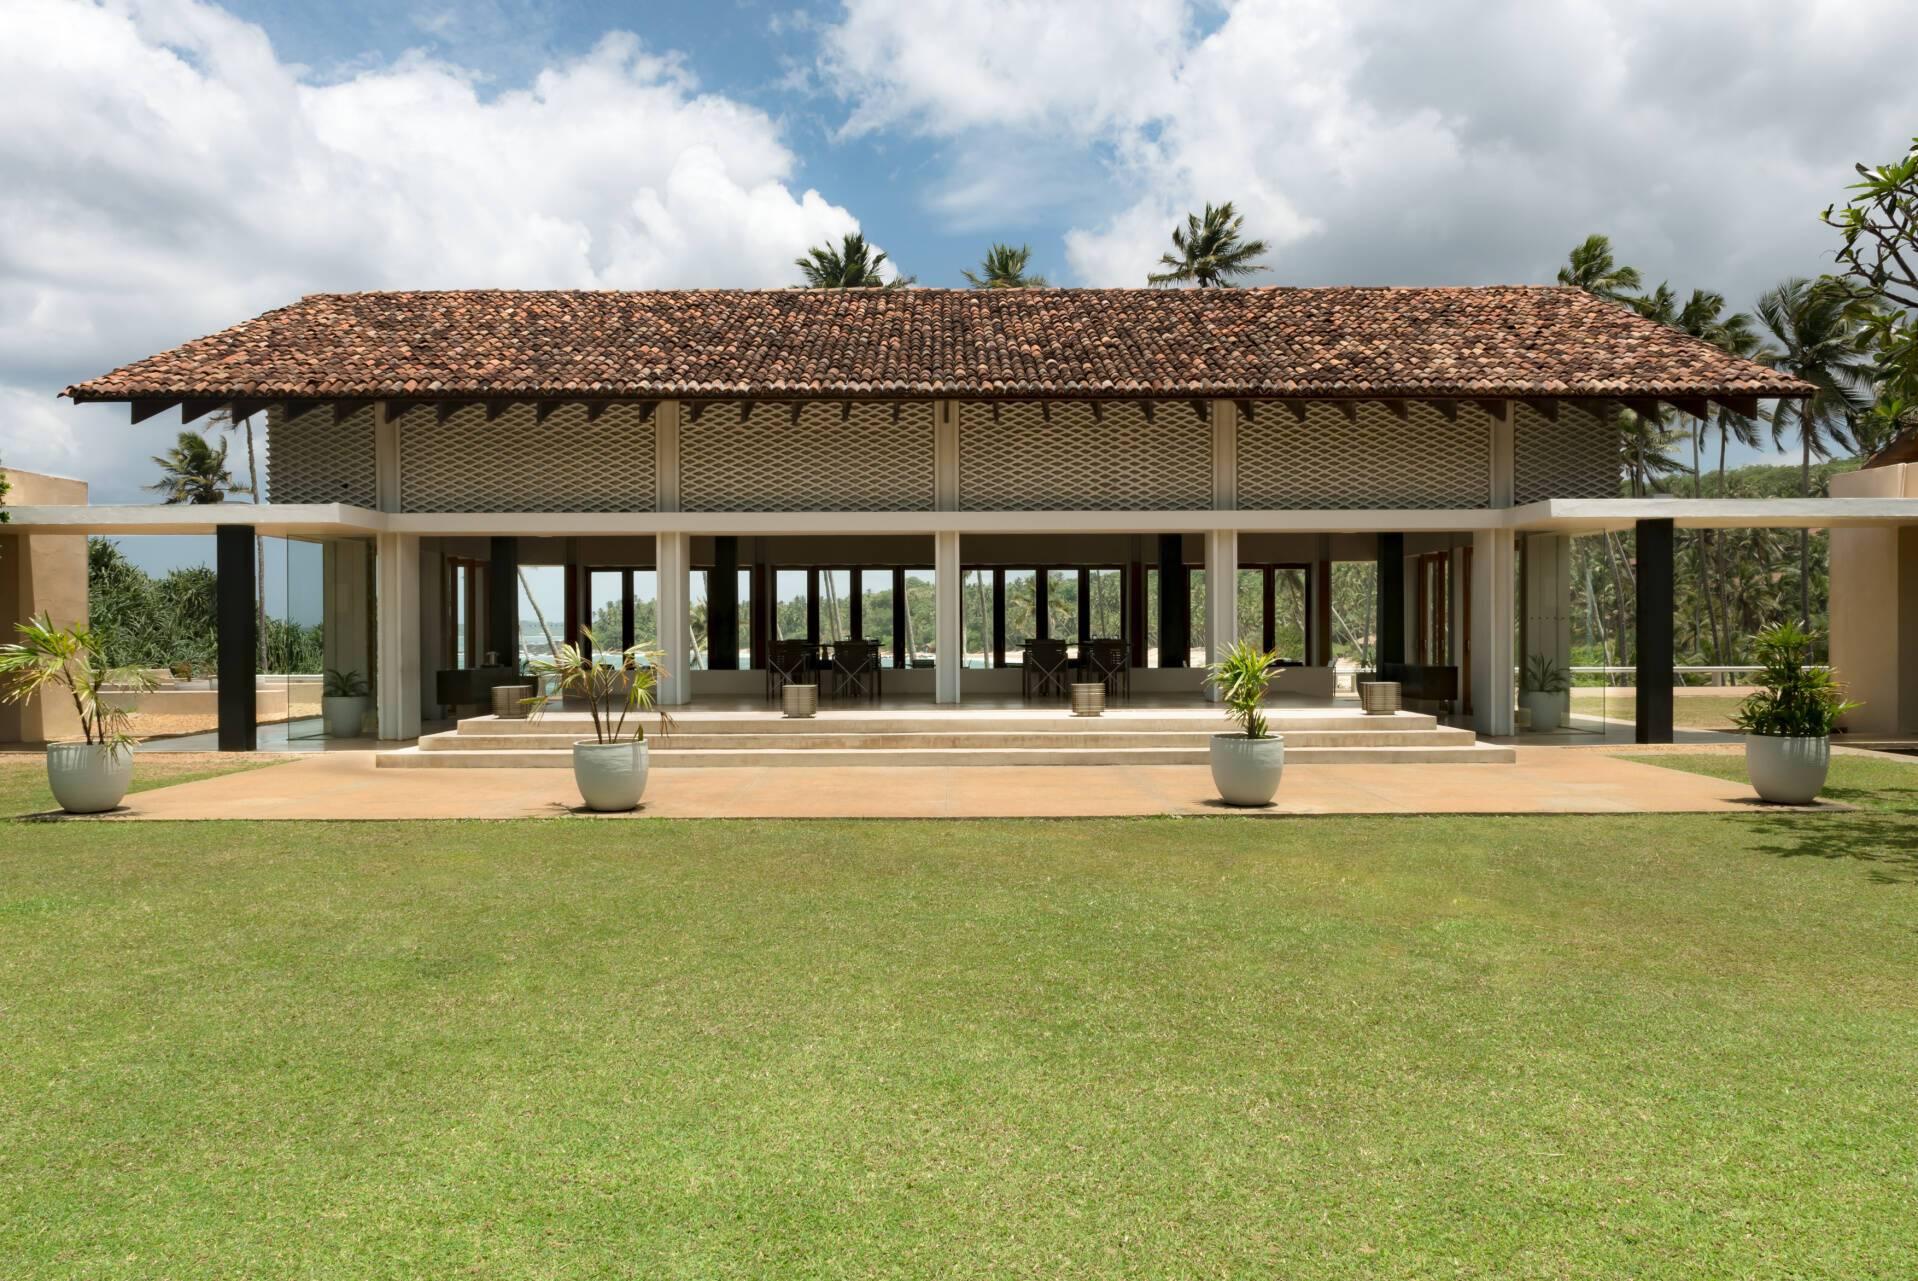 Amanwella Sri Lanka Lobby